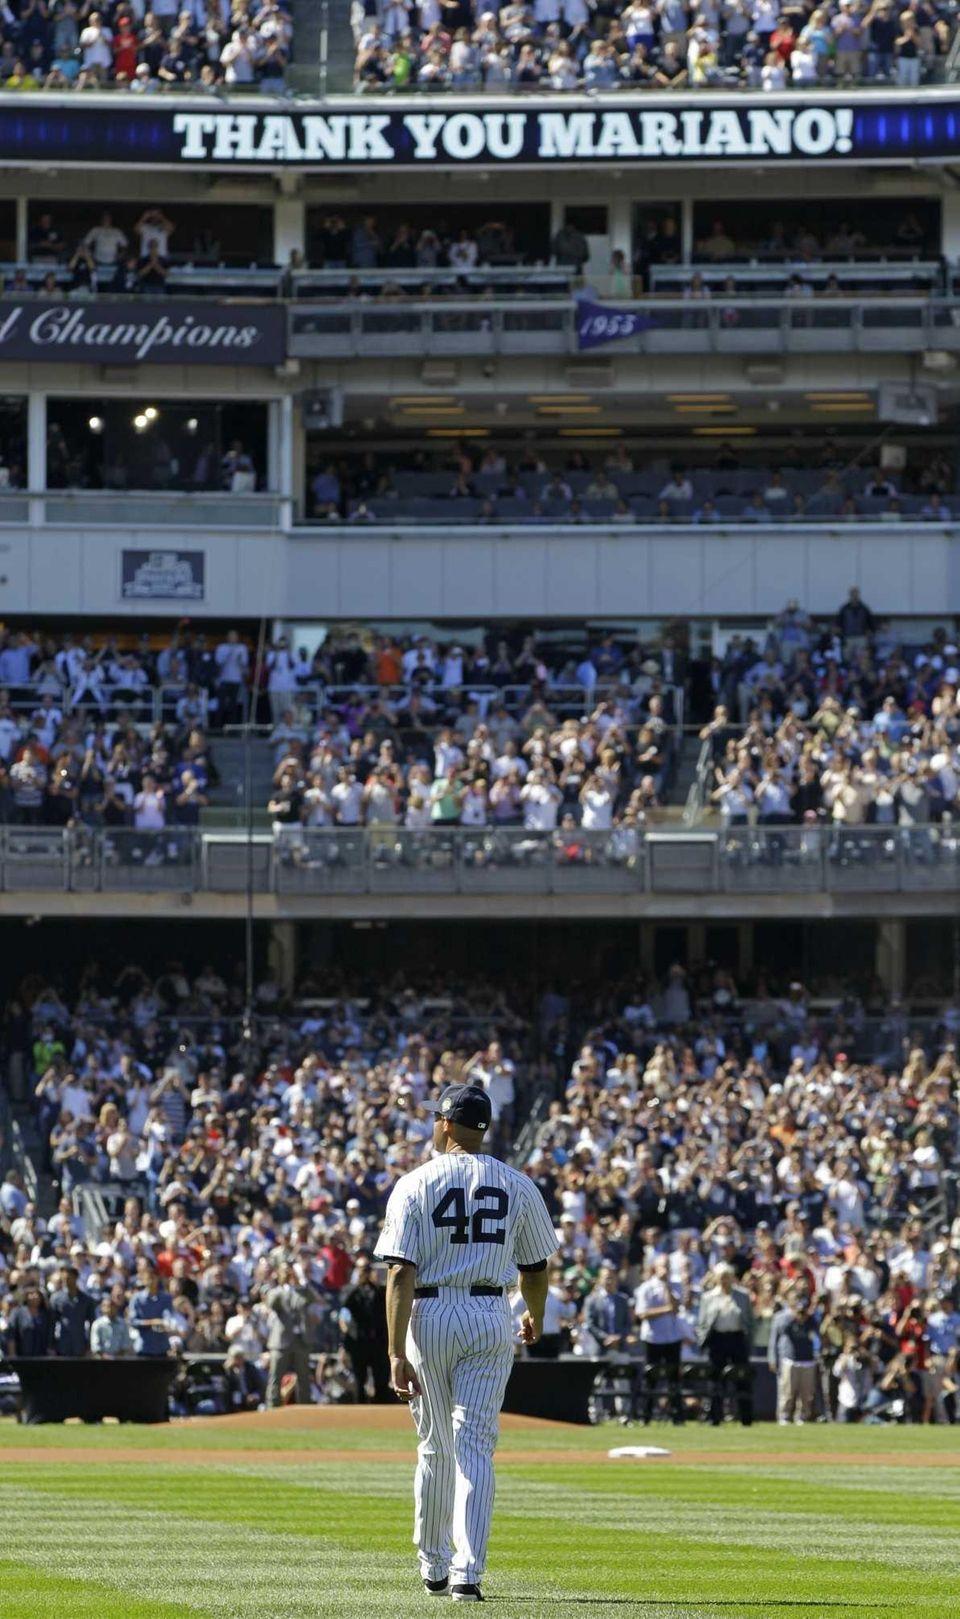 New York Yankees relief pitcher Mariano Rivera walks